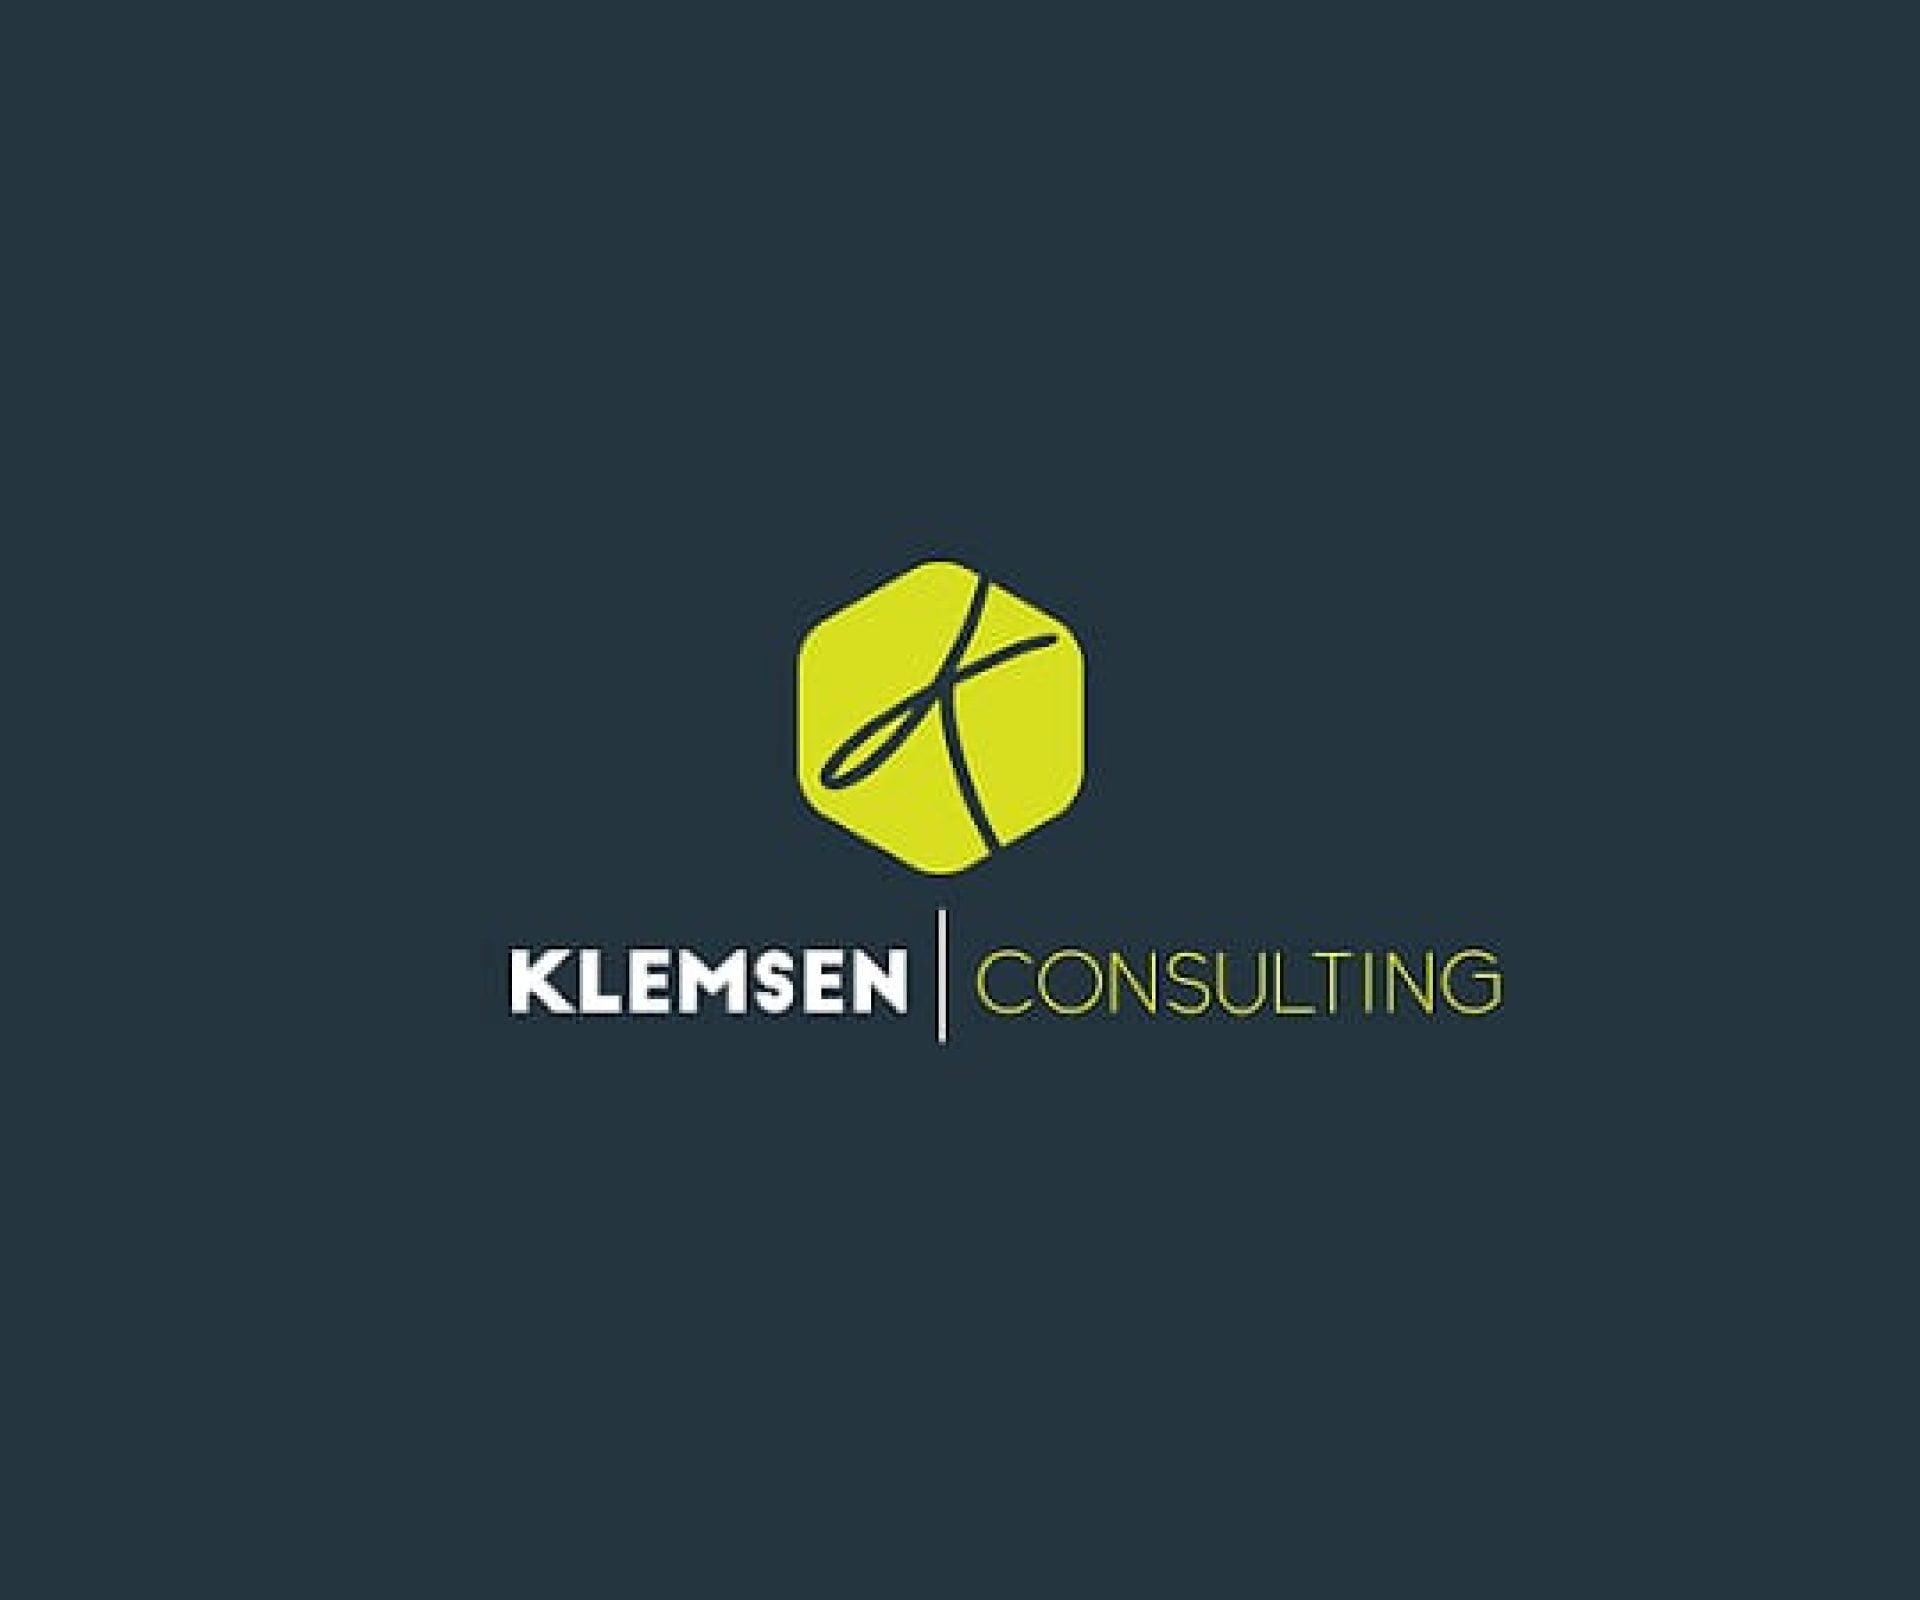 Klemsen Consulting | Yongin-si, Gyeonggi